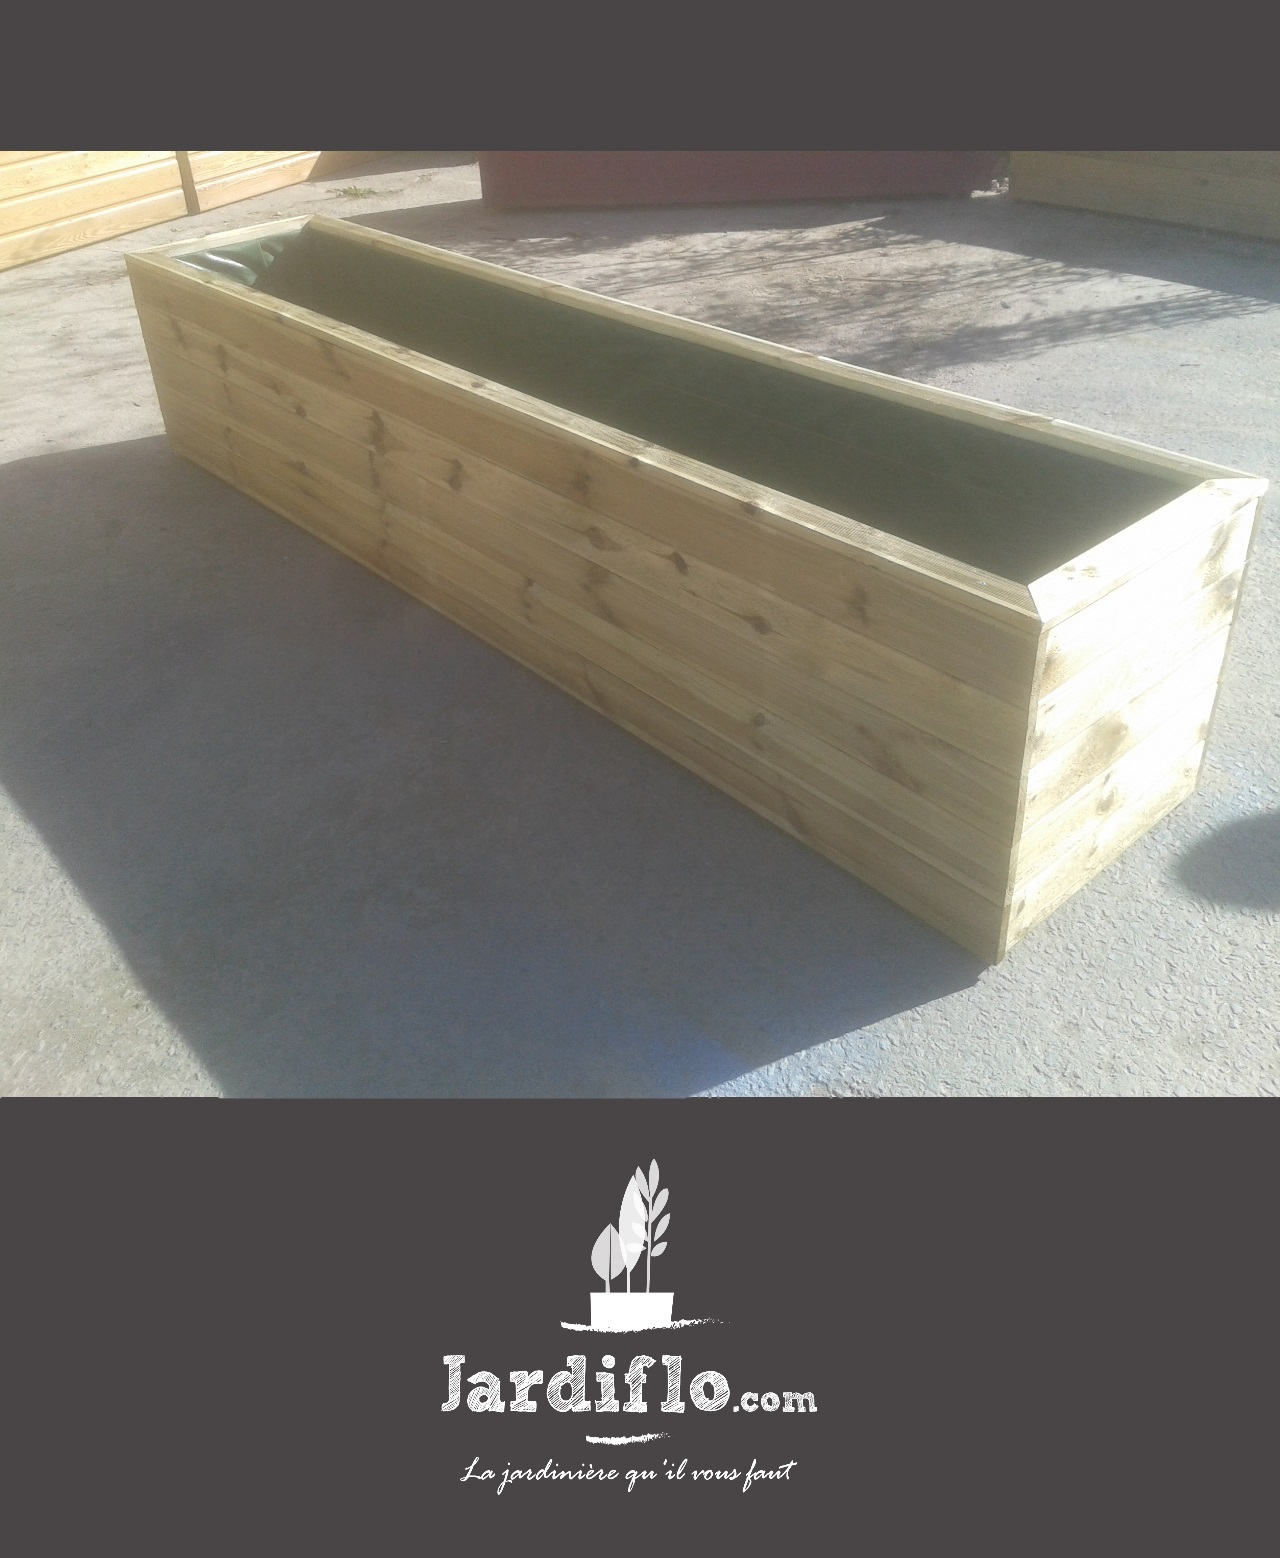 Jardini re 200x50x50 330l standard jardini re rectangulaire jardini re xxl en bois certifi - Jardiniere xxl ...